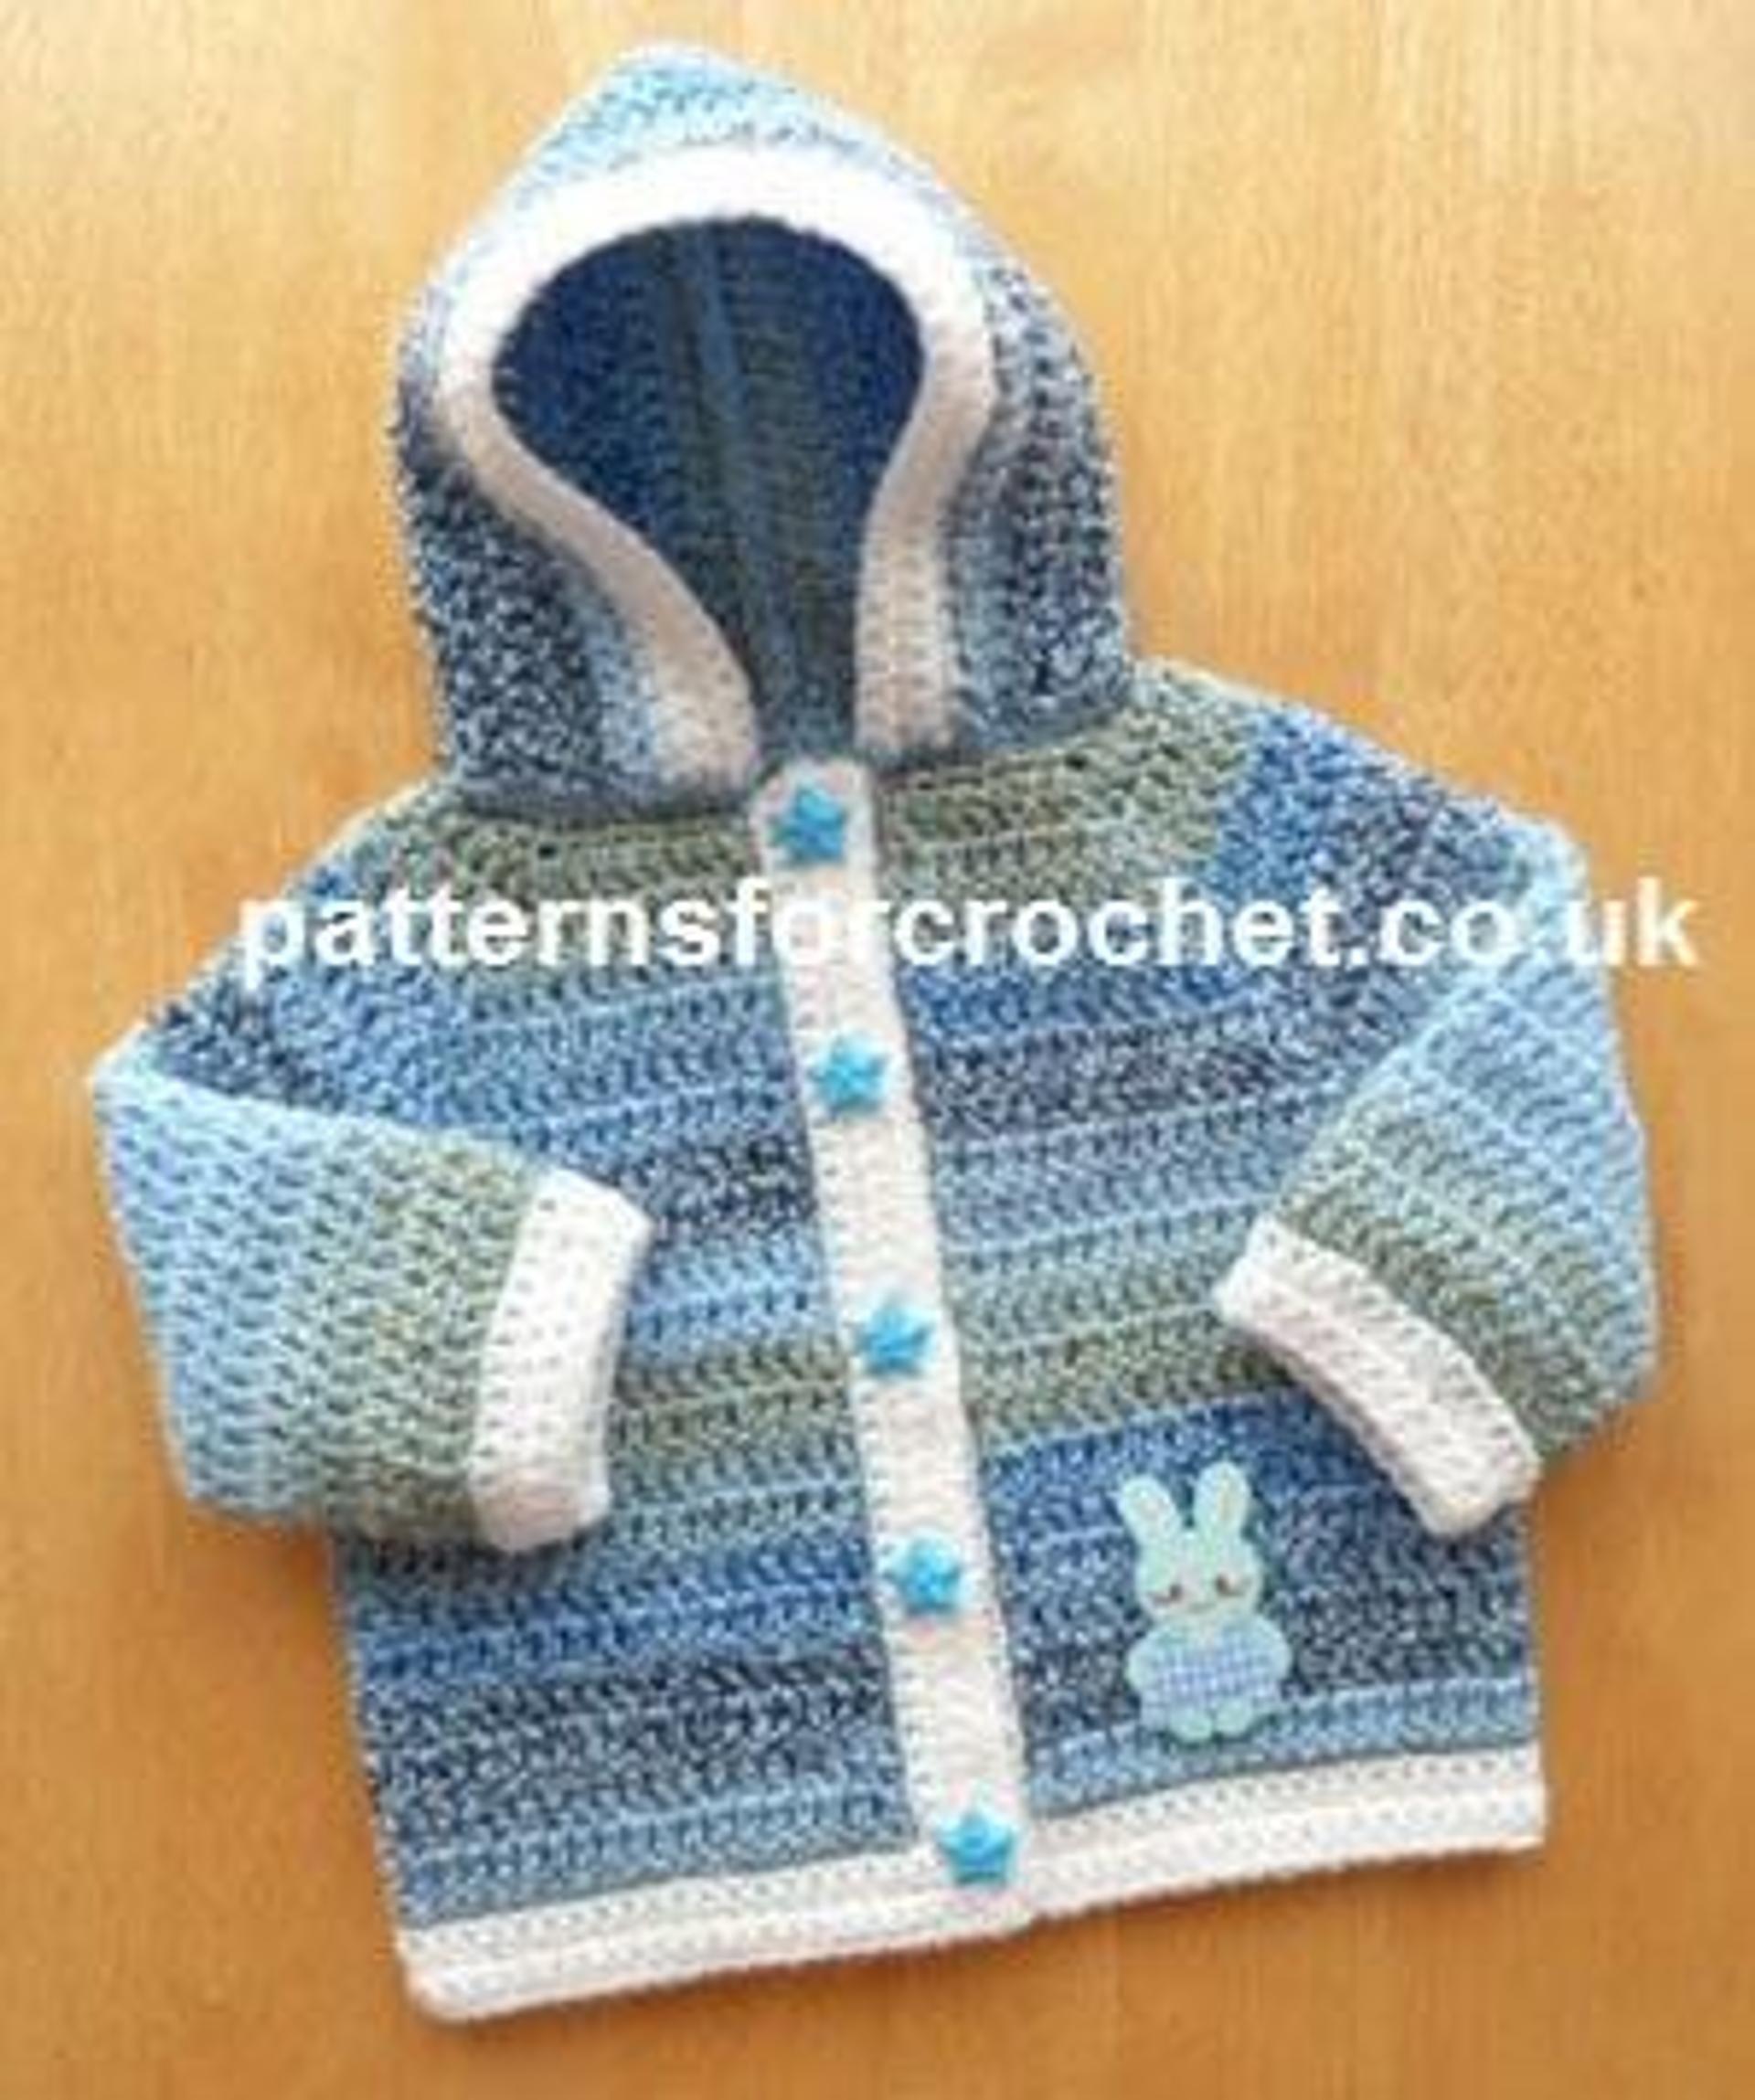 pfc236-Hooded jacket baby crochet pattern | Craftsy | Crocheting ...